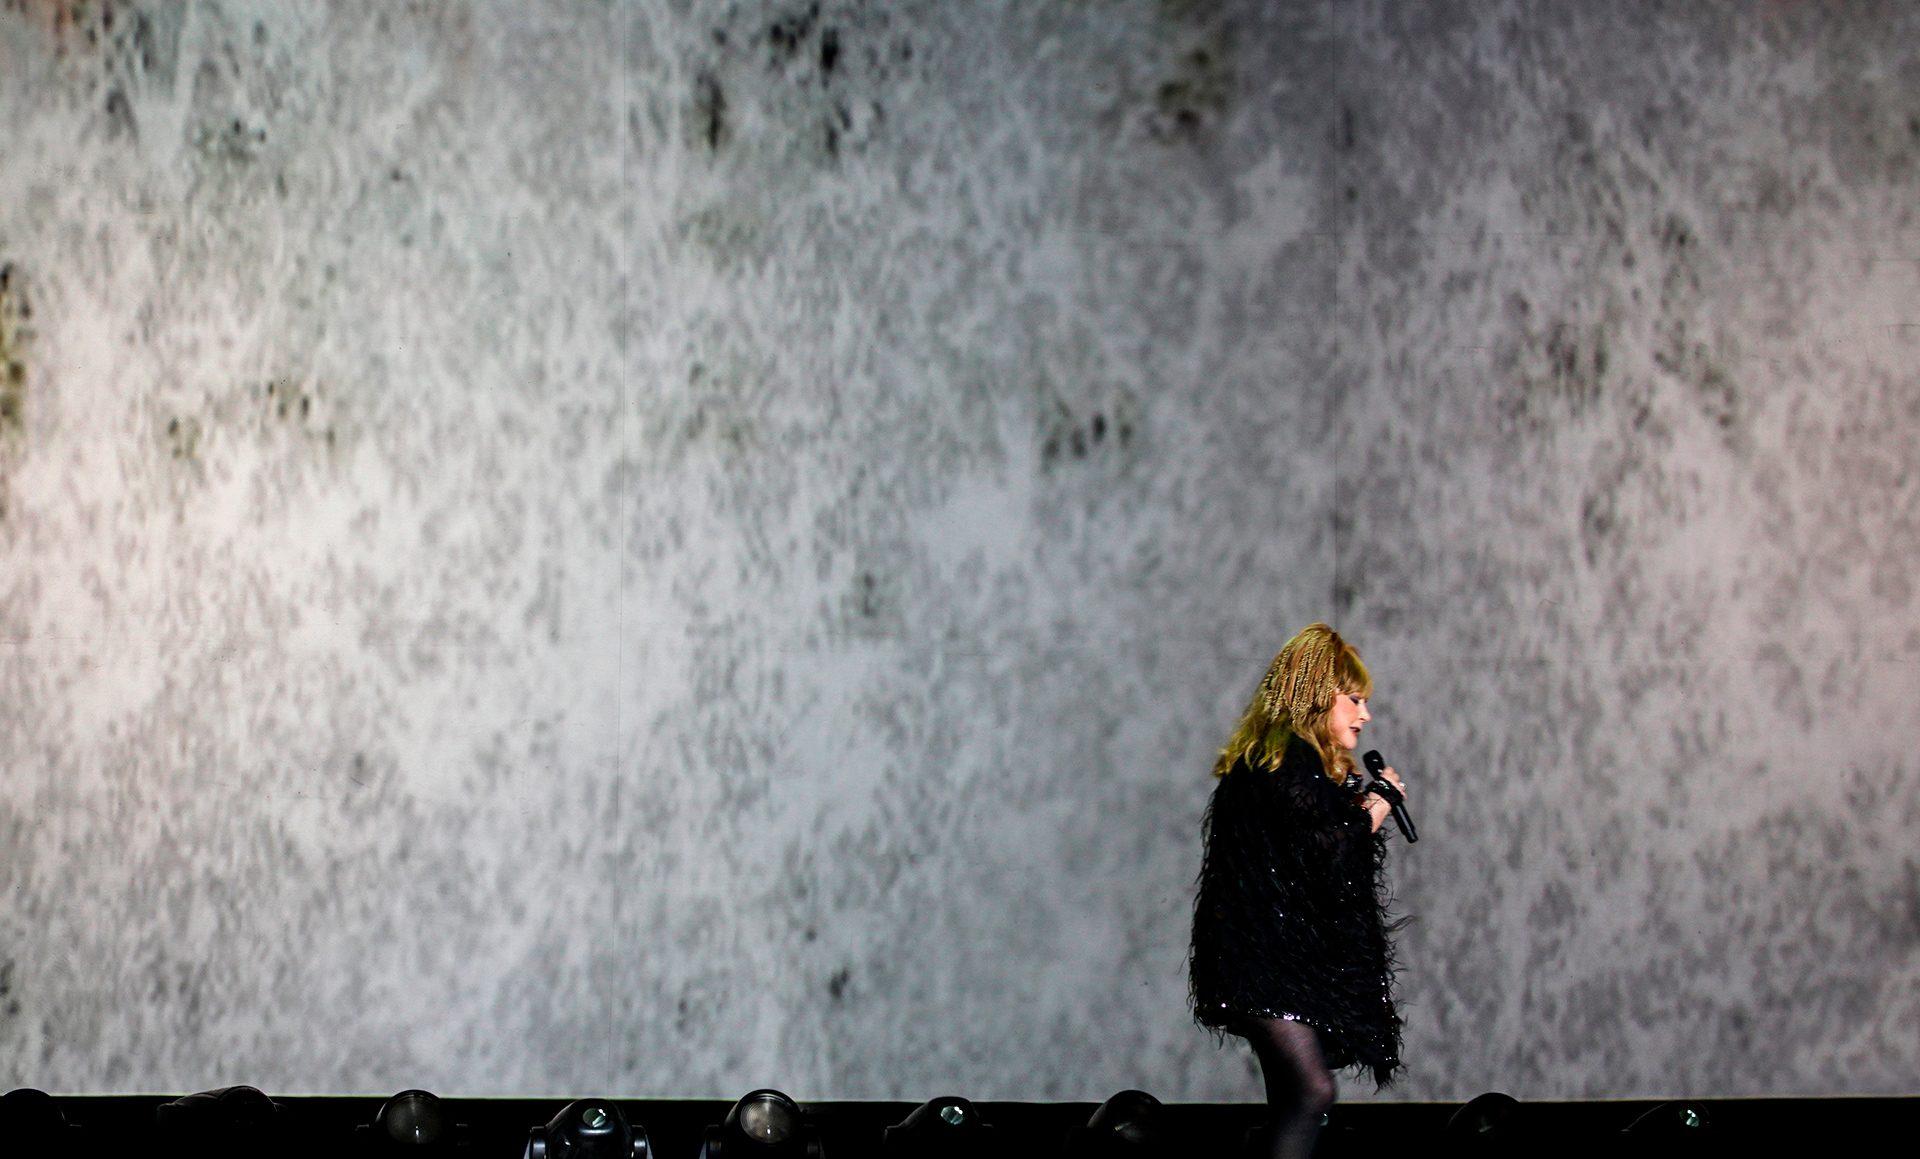 Alla Pugacheva, farewell tours Almaty, show, pop singer, concert., gig, Алла Пугачёва